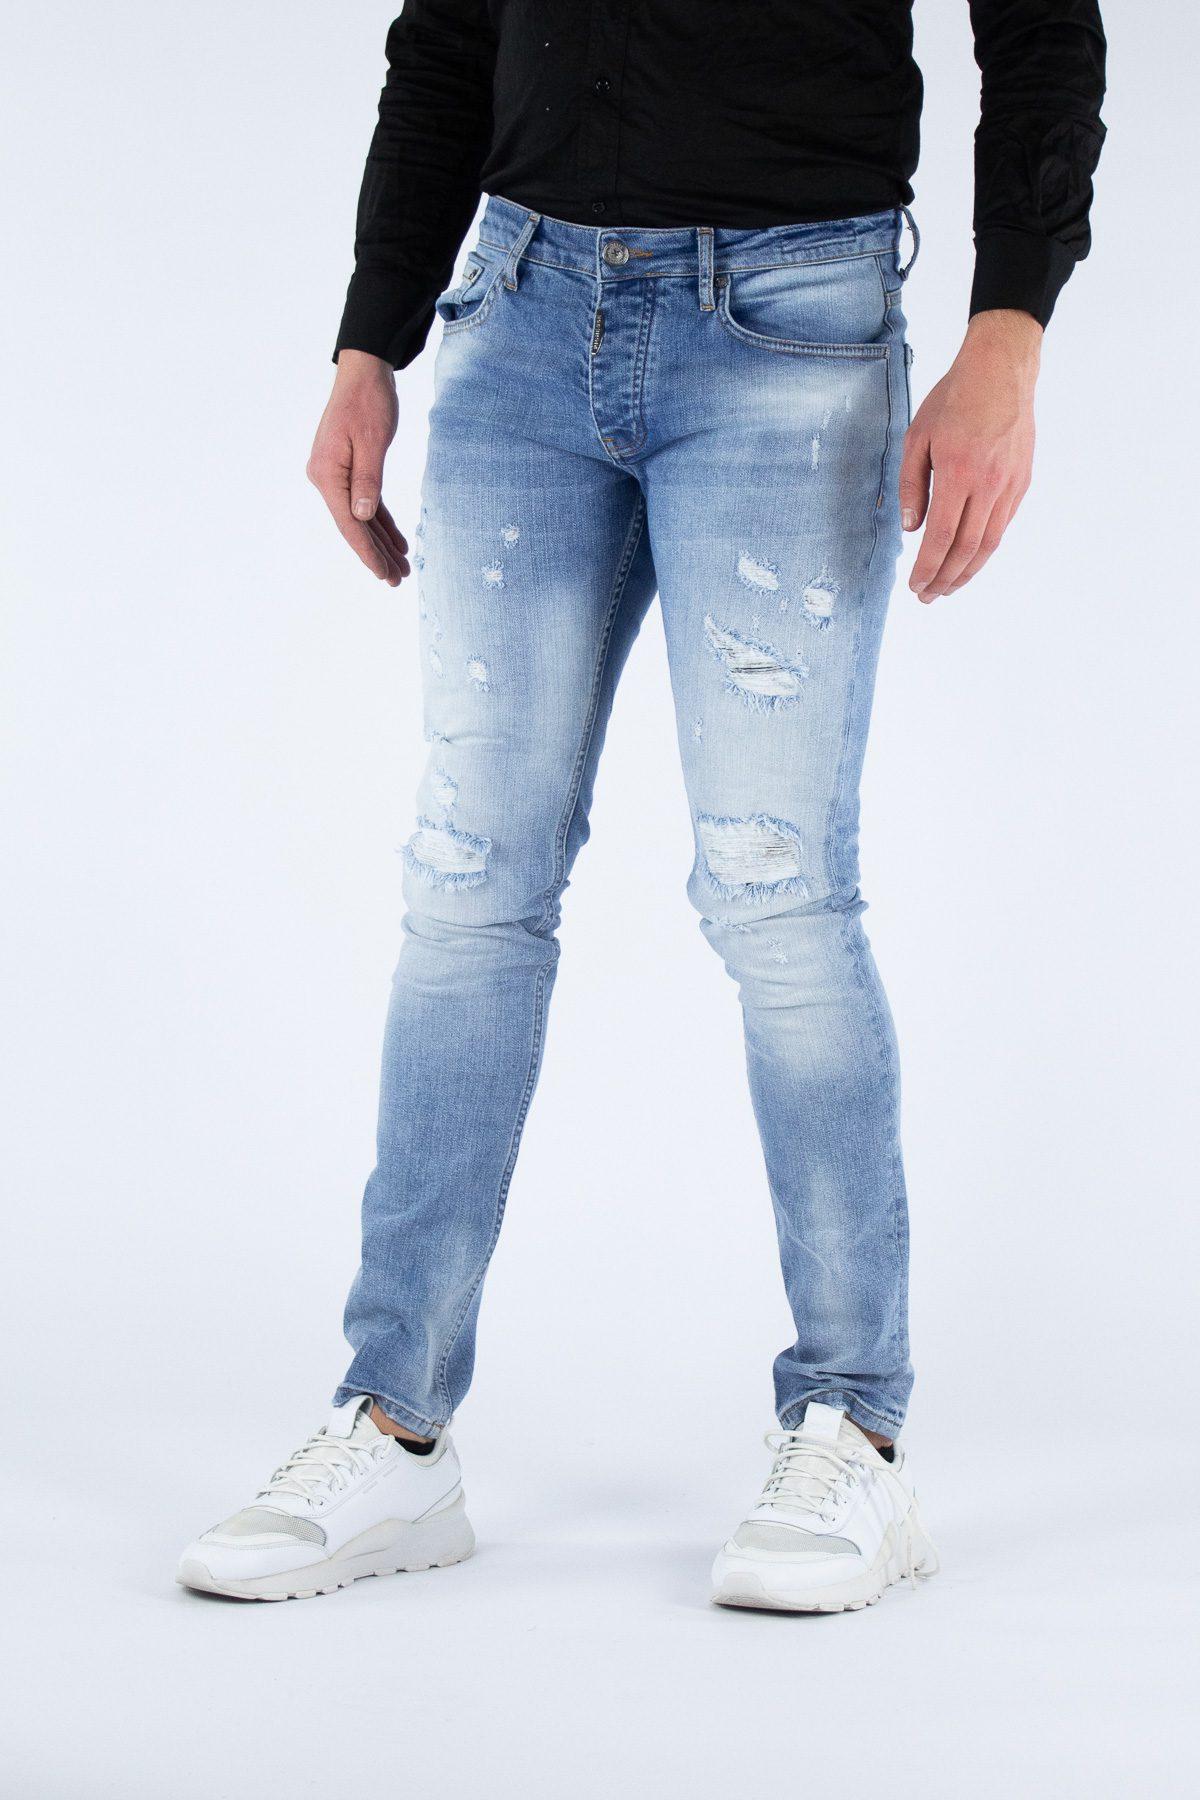 Clarity Light Blue Jeans – 2241-6-3